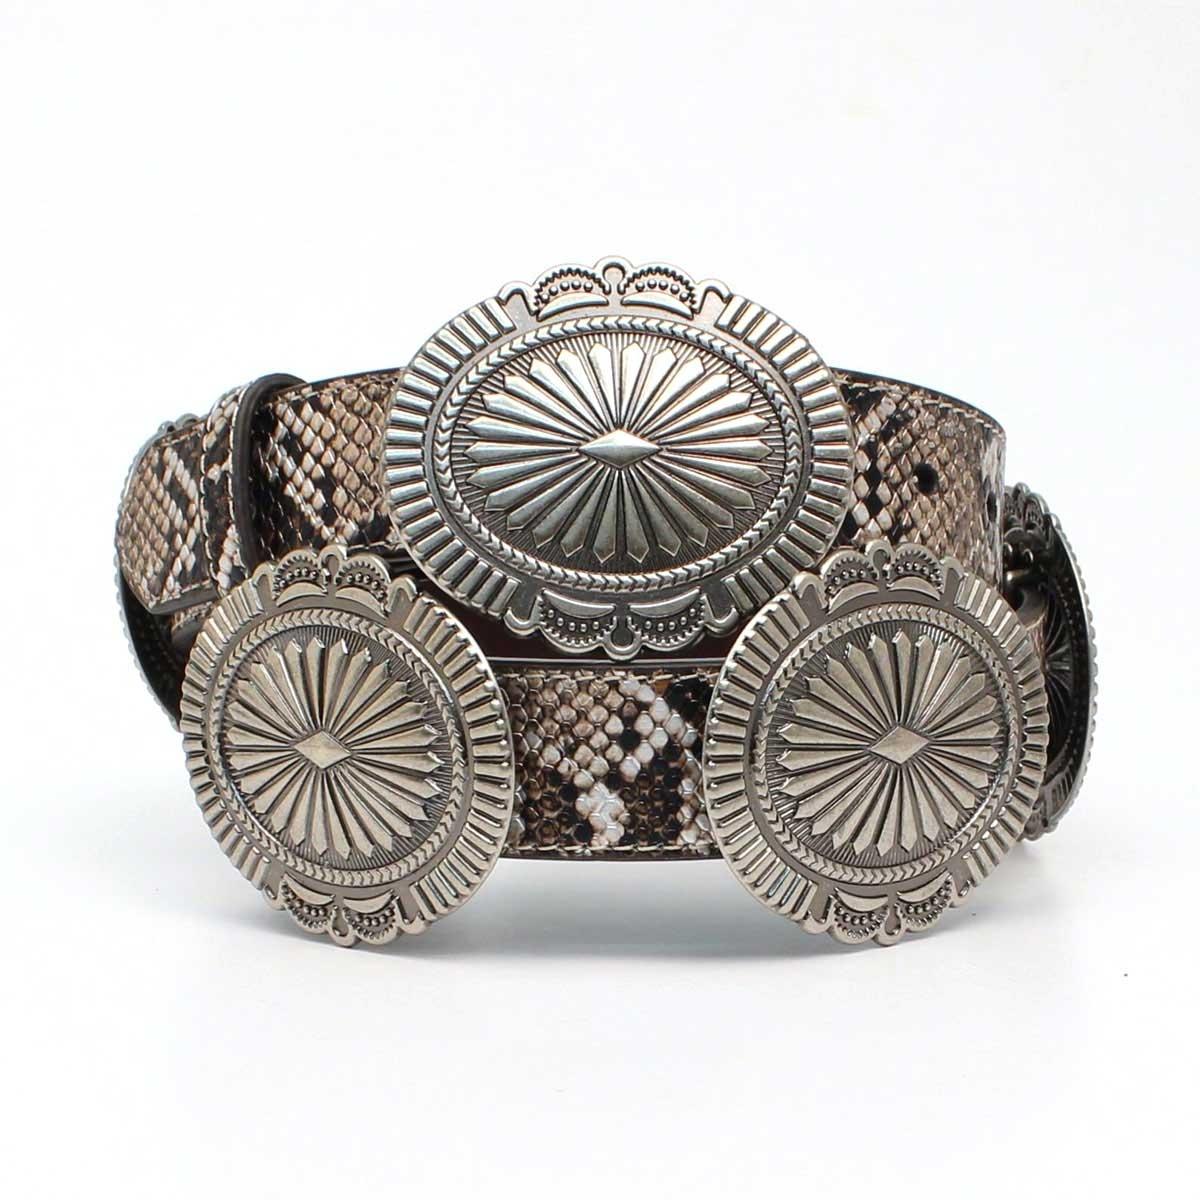 Ariat Silver Snakeskin Belt - Women's Belt